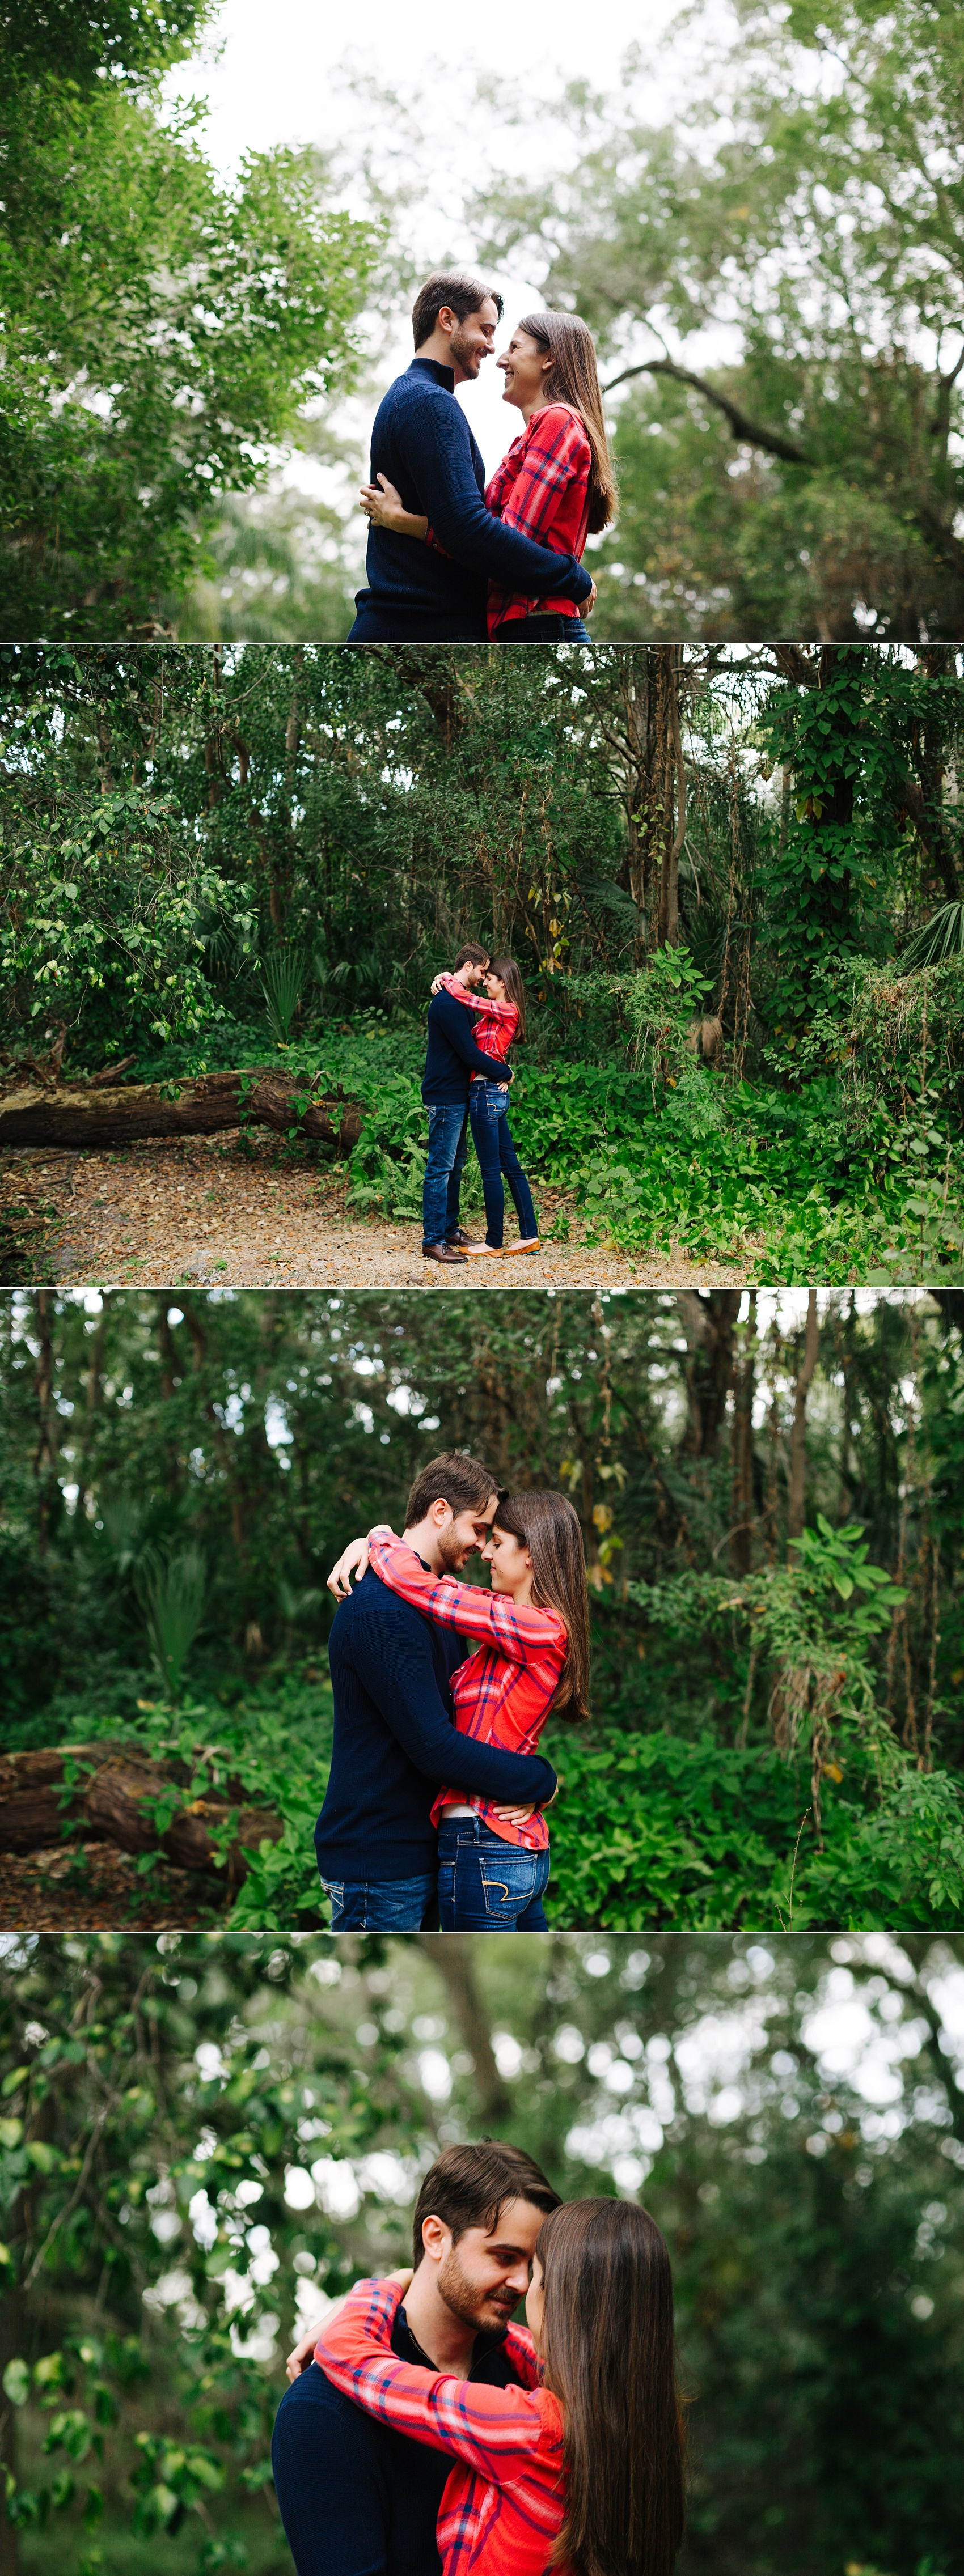 Jake & Katie Photography Seminole Heights Engagement Photos David & Cailyn-001.jpg